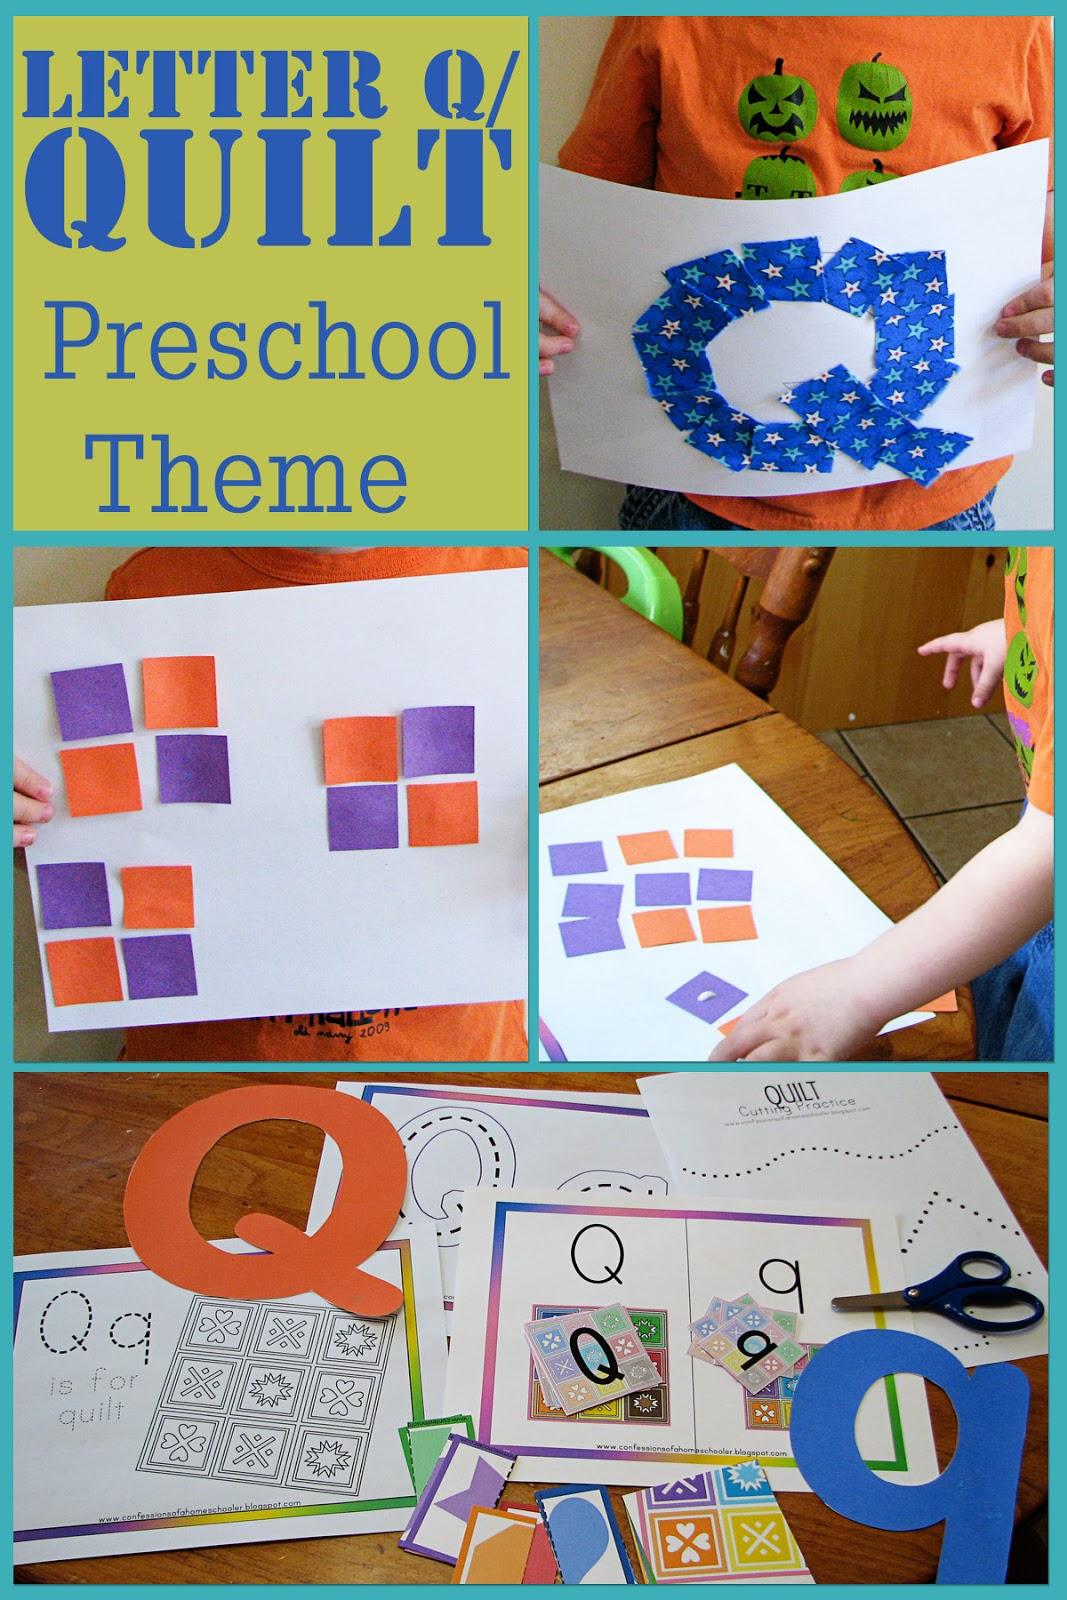 mommy u0026 39 s little helper  letter q  quilt preschool theme